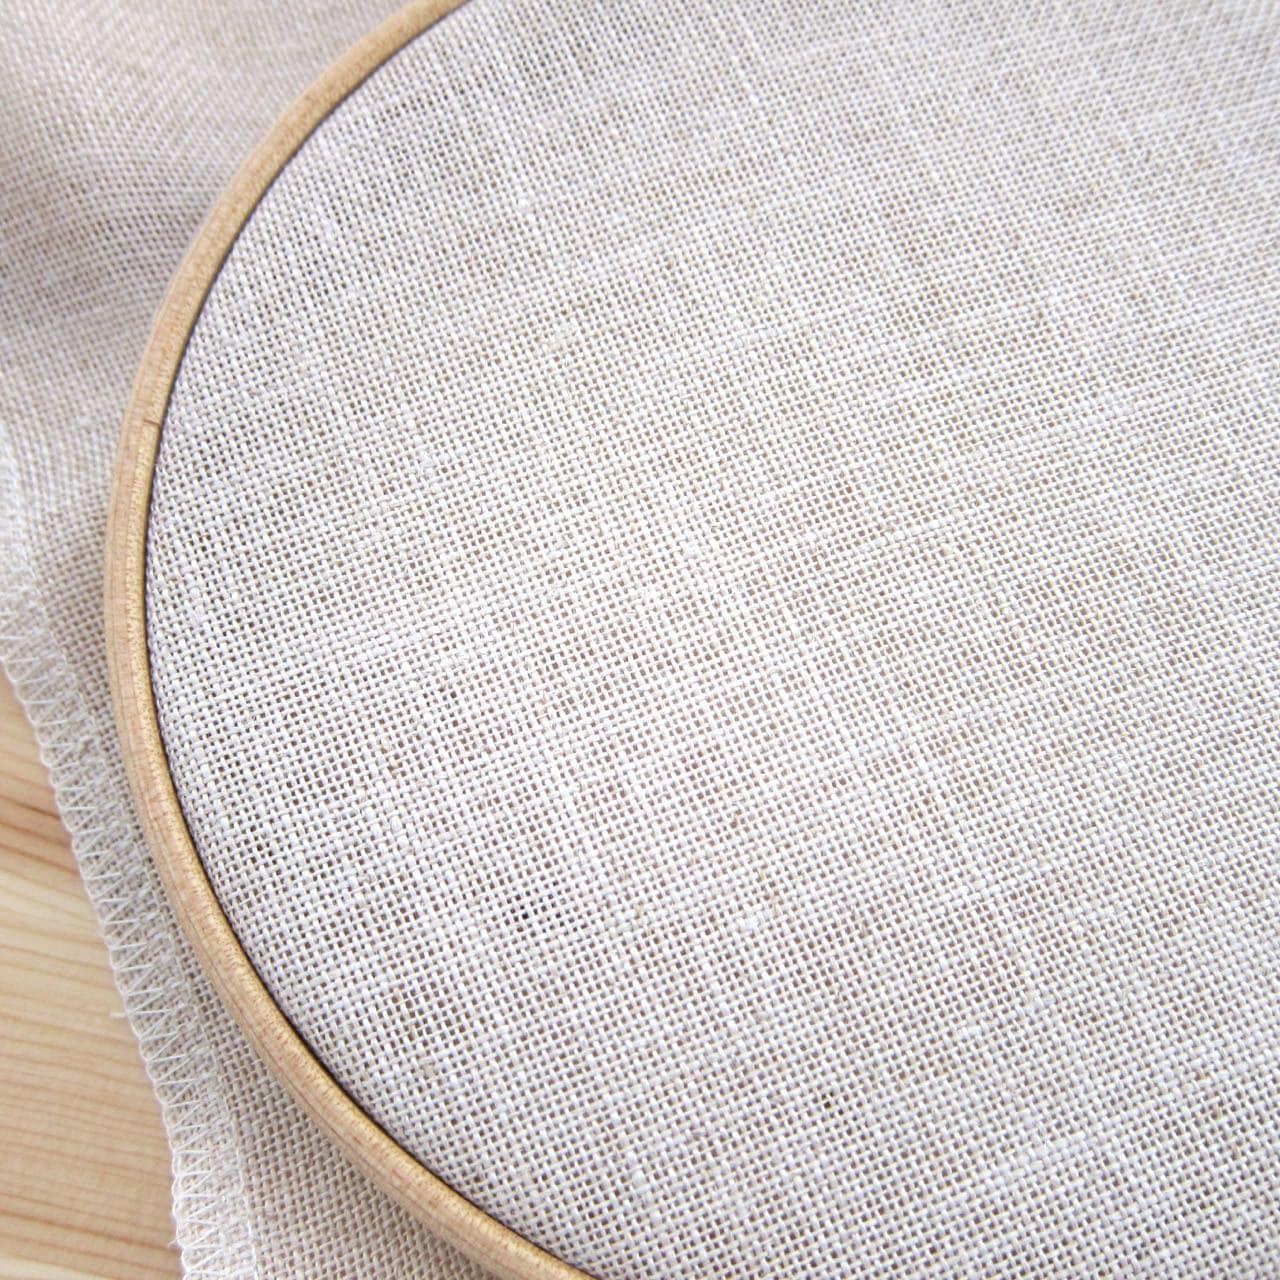 Cross stitch fabric count linen cashel in rustic